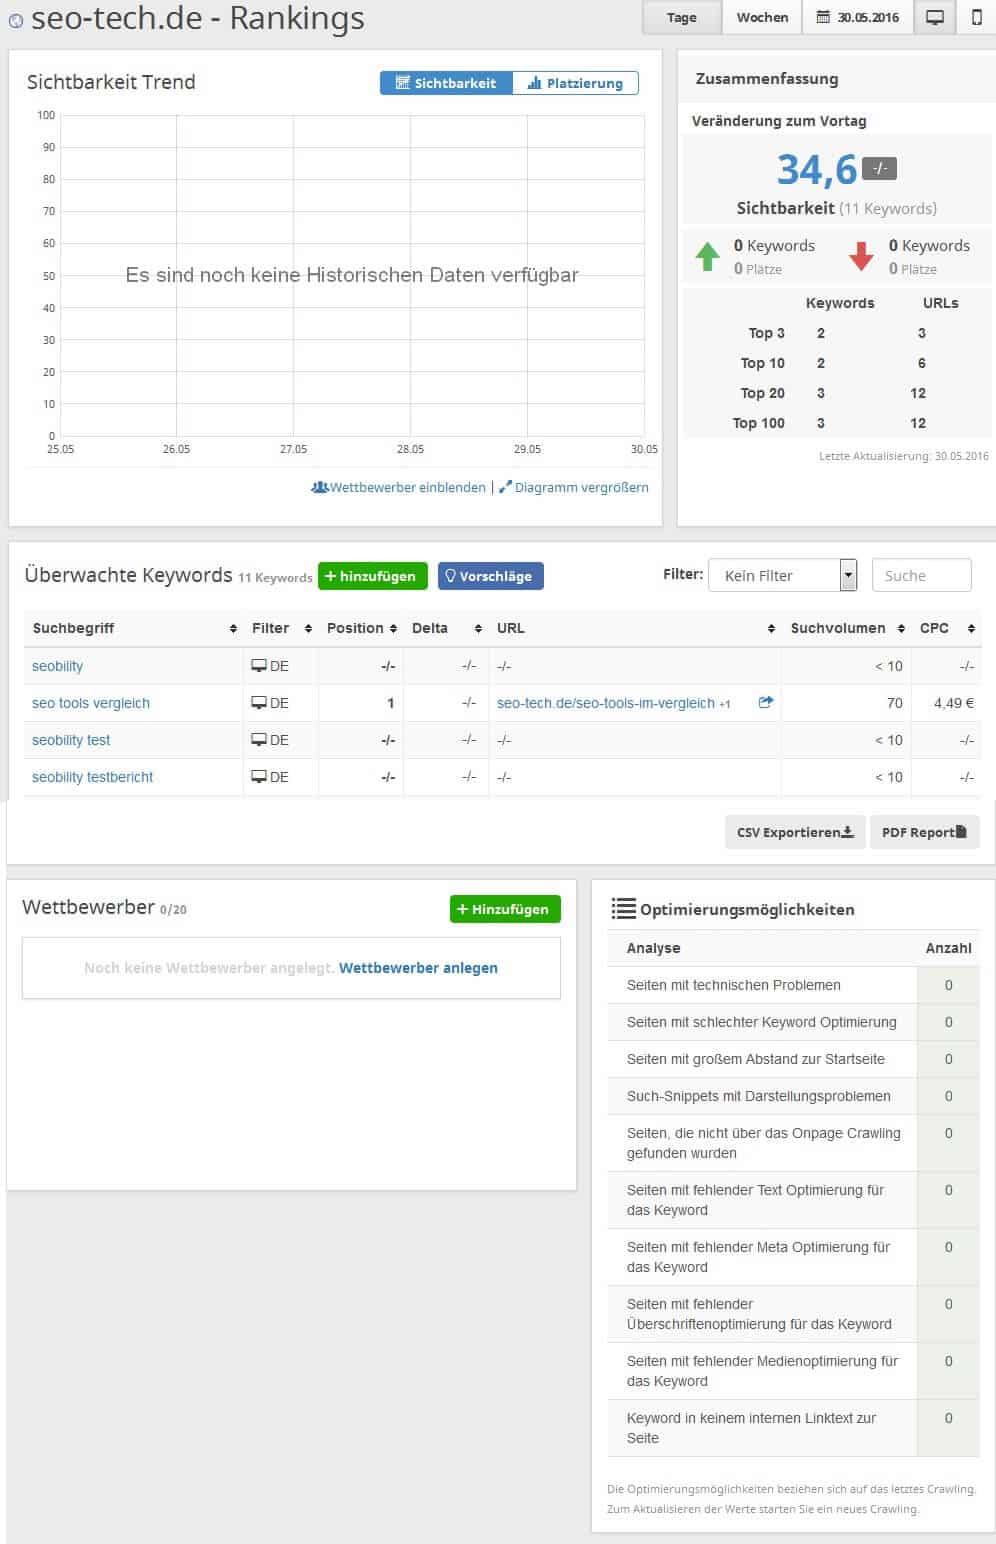 seobility Rankingübersicht by seo-tech.de